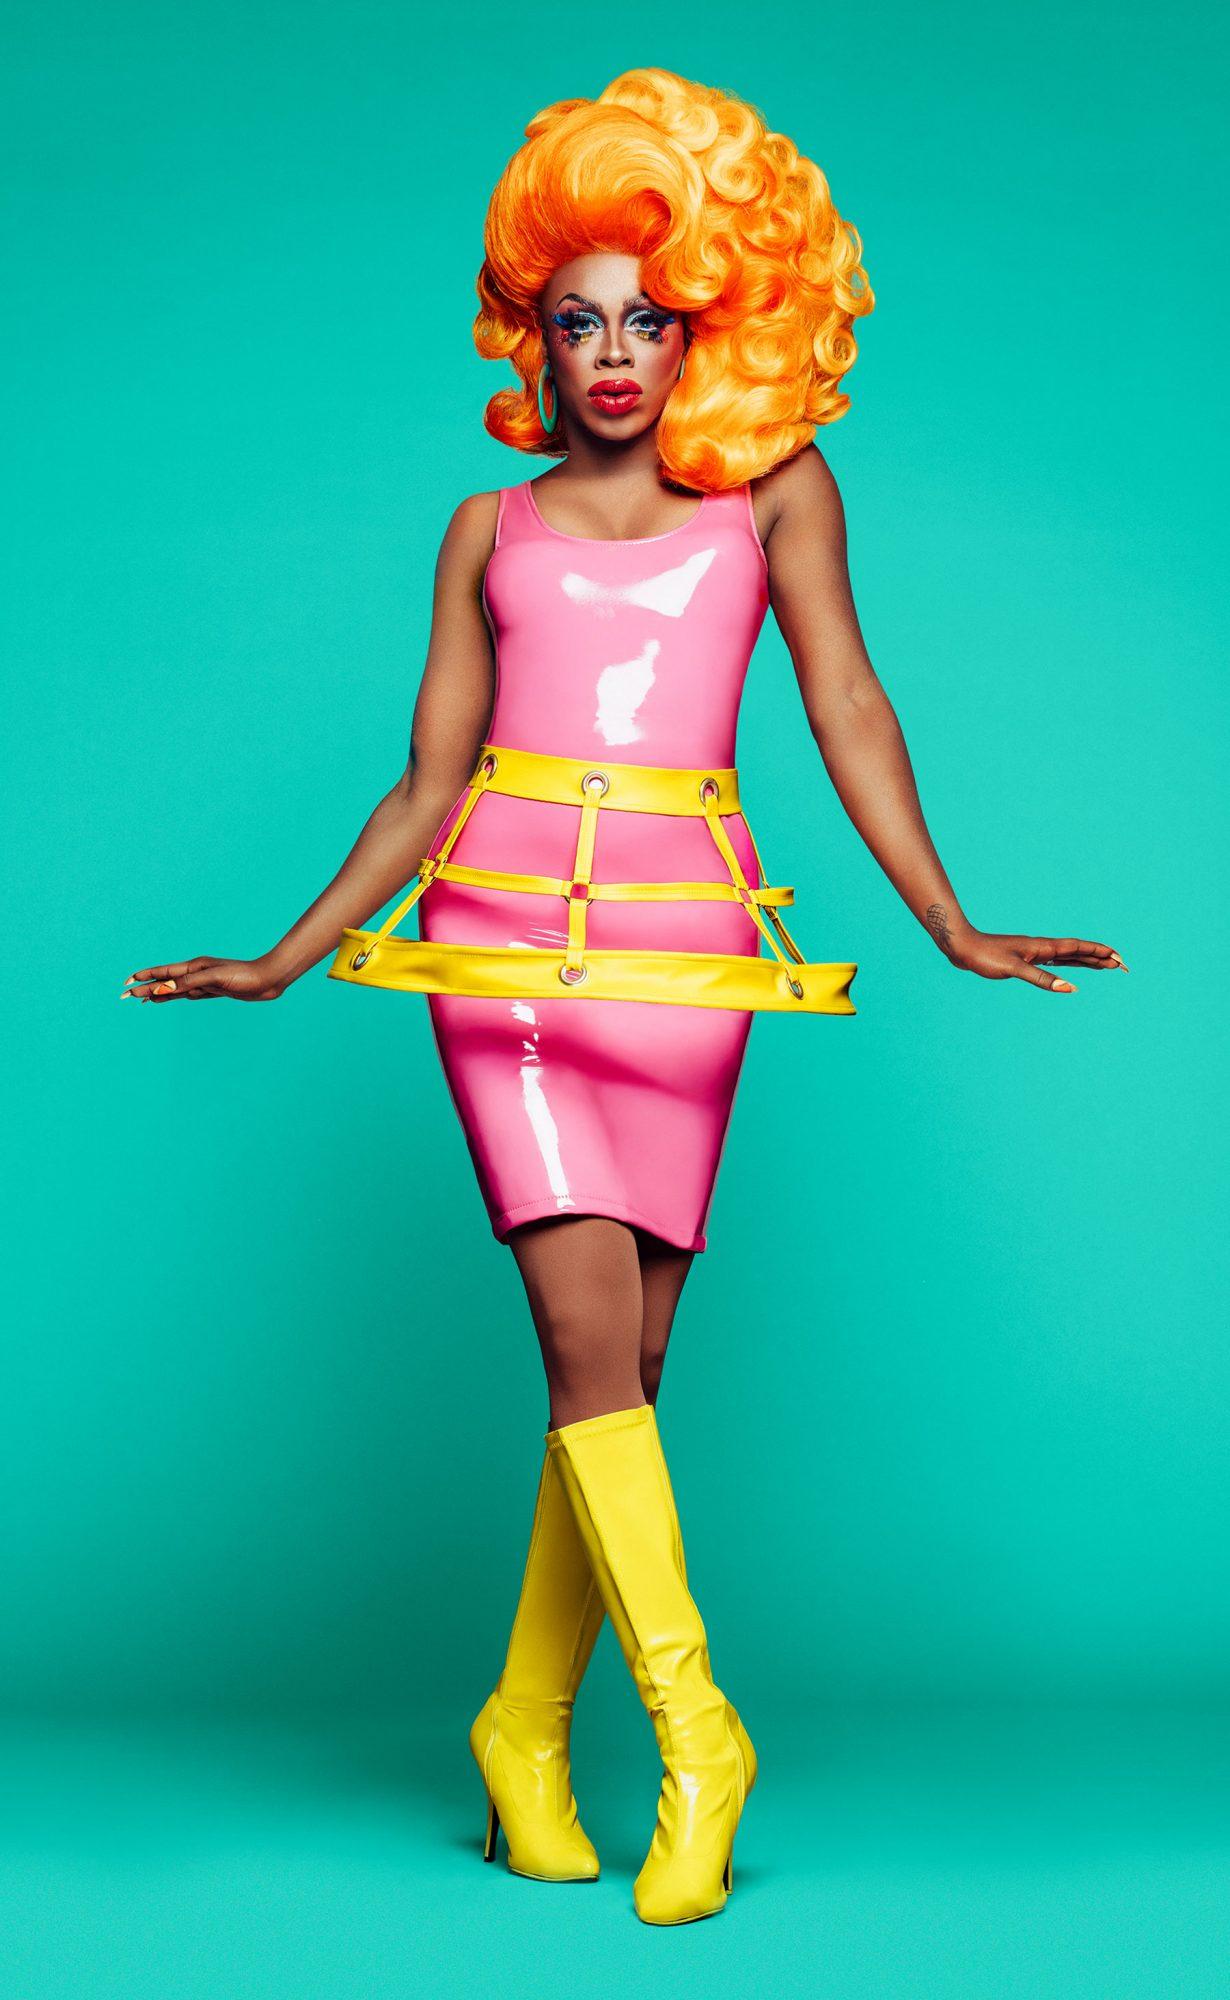 RuPaul Drag Race Season 11 cast photo -- Pictured: Honey DavenportCR: VH1